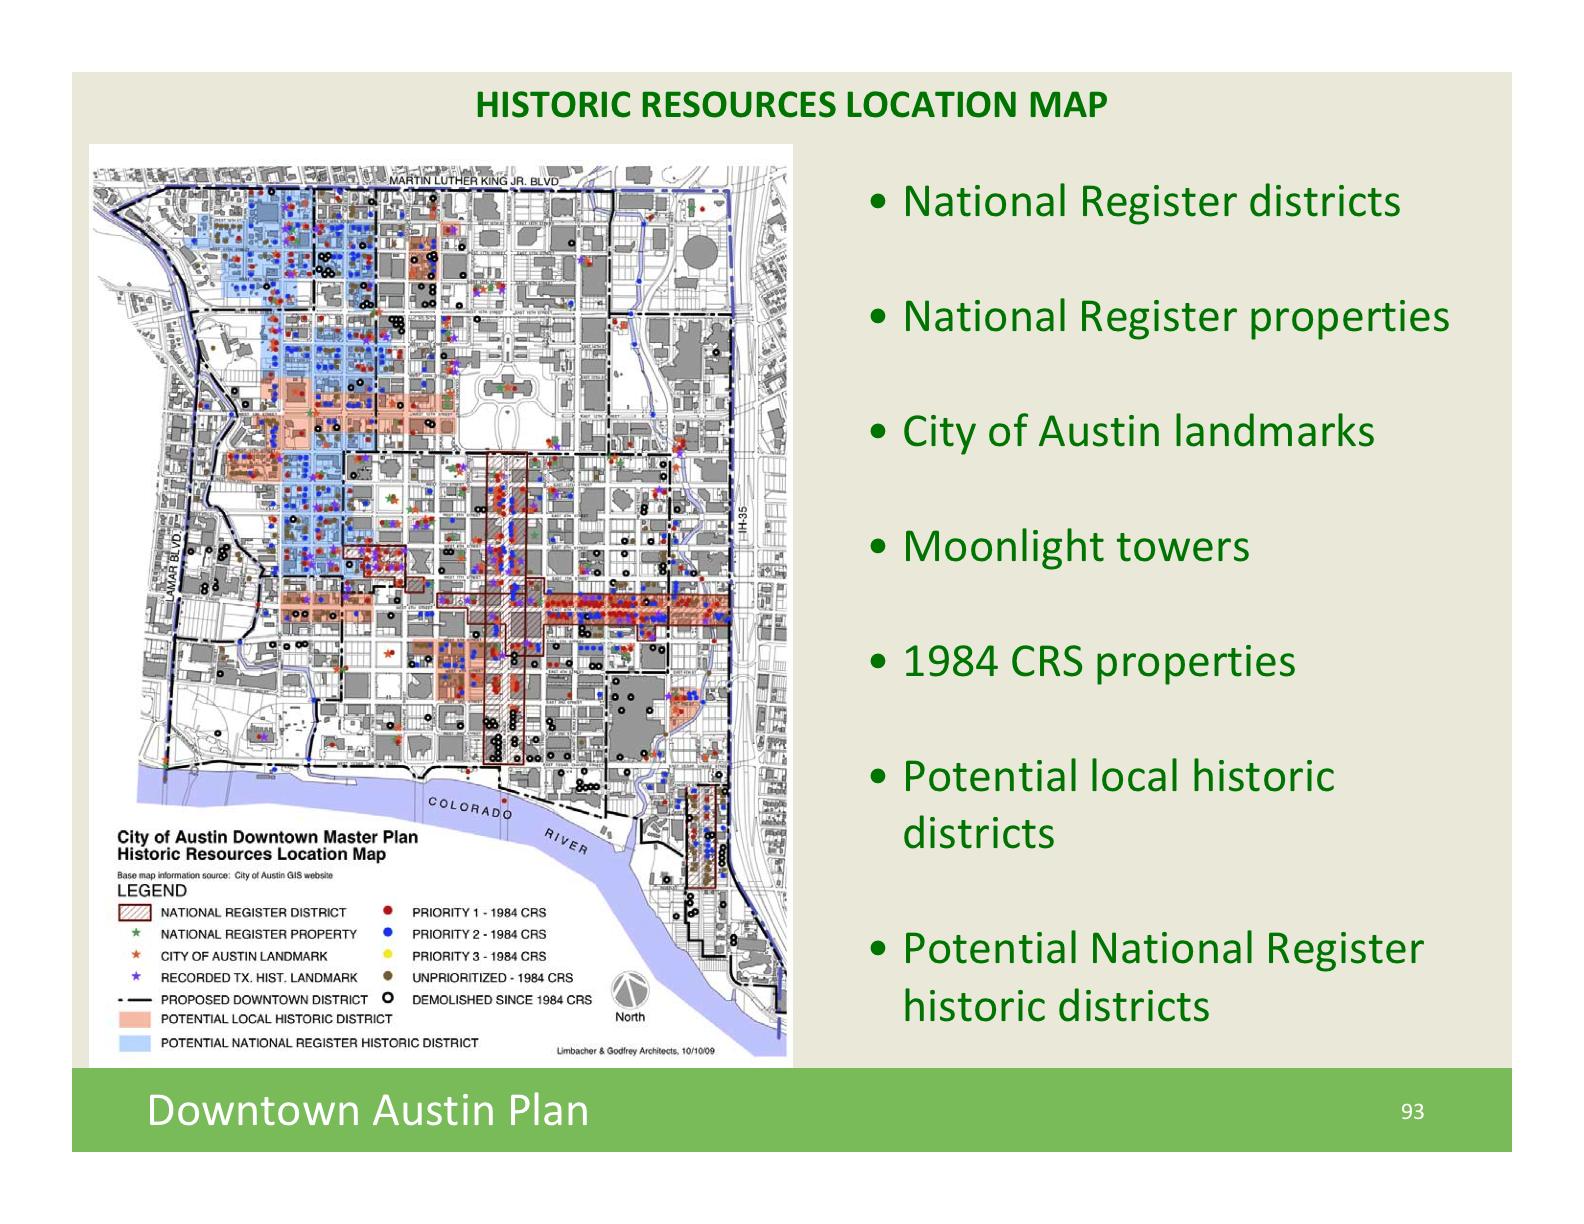 DAPTownHallMtg10-10-09 - historic preservation strategies map